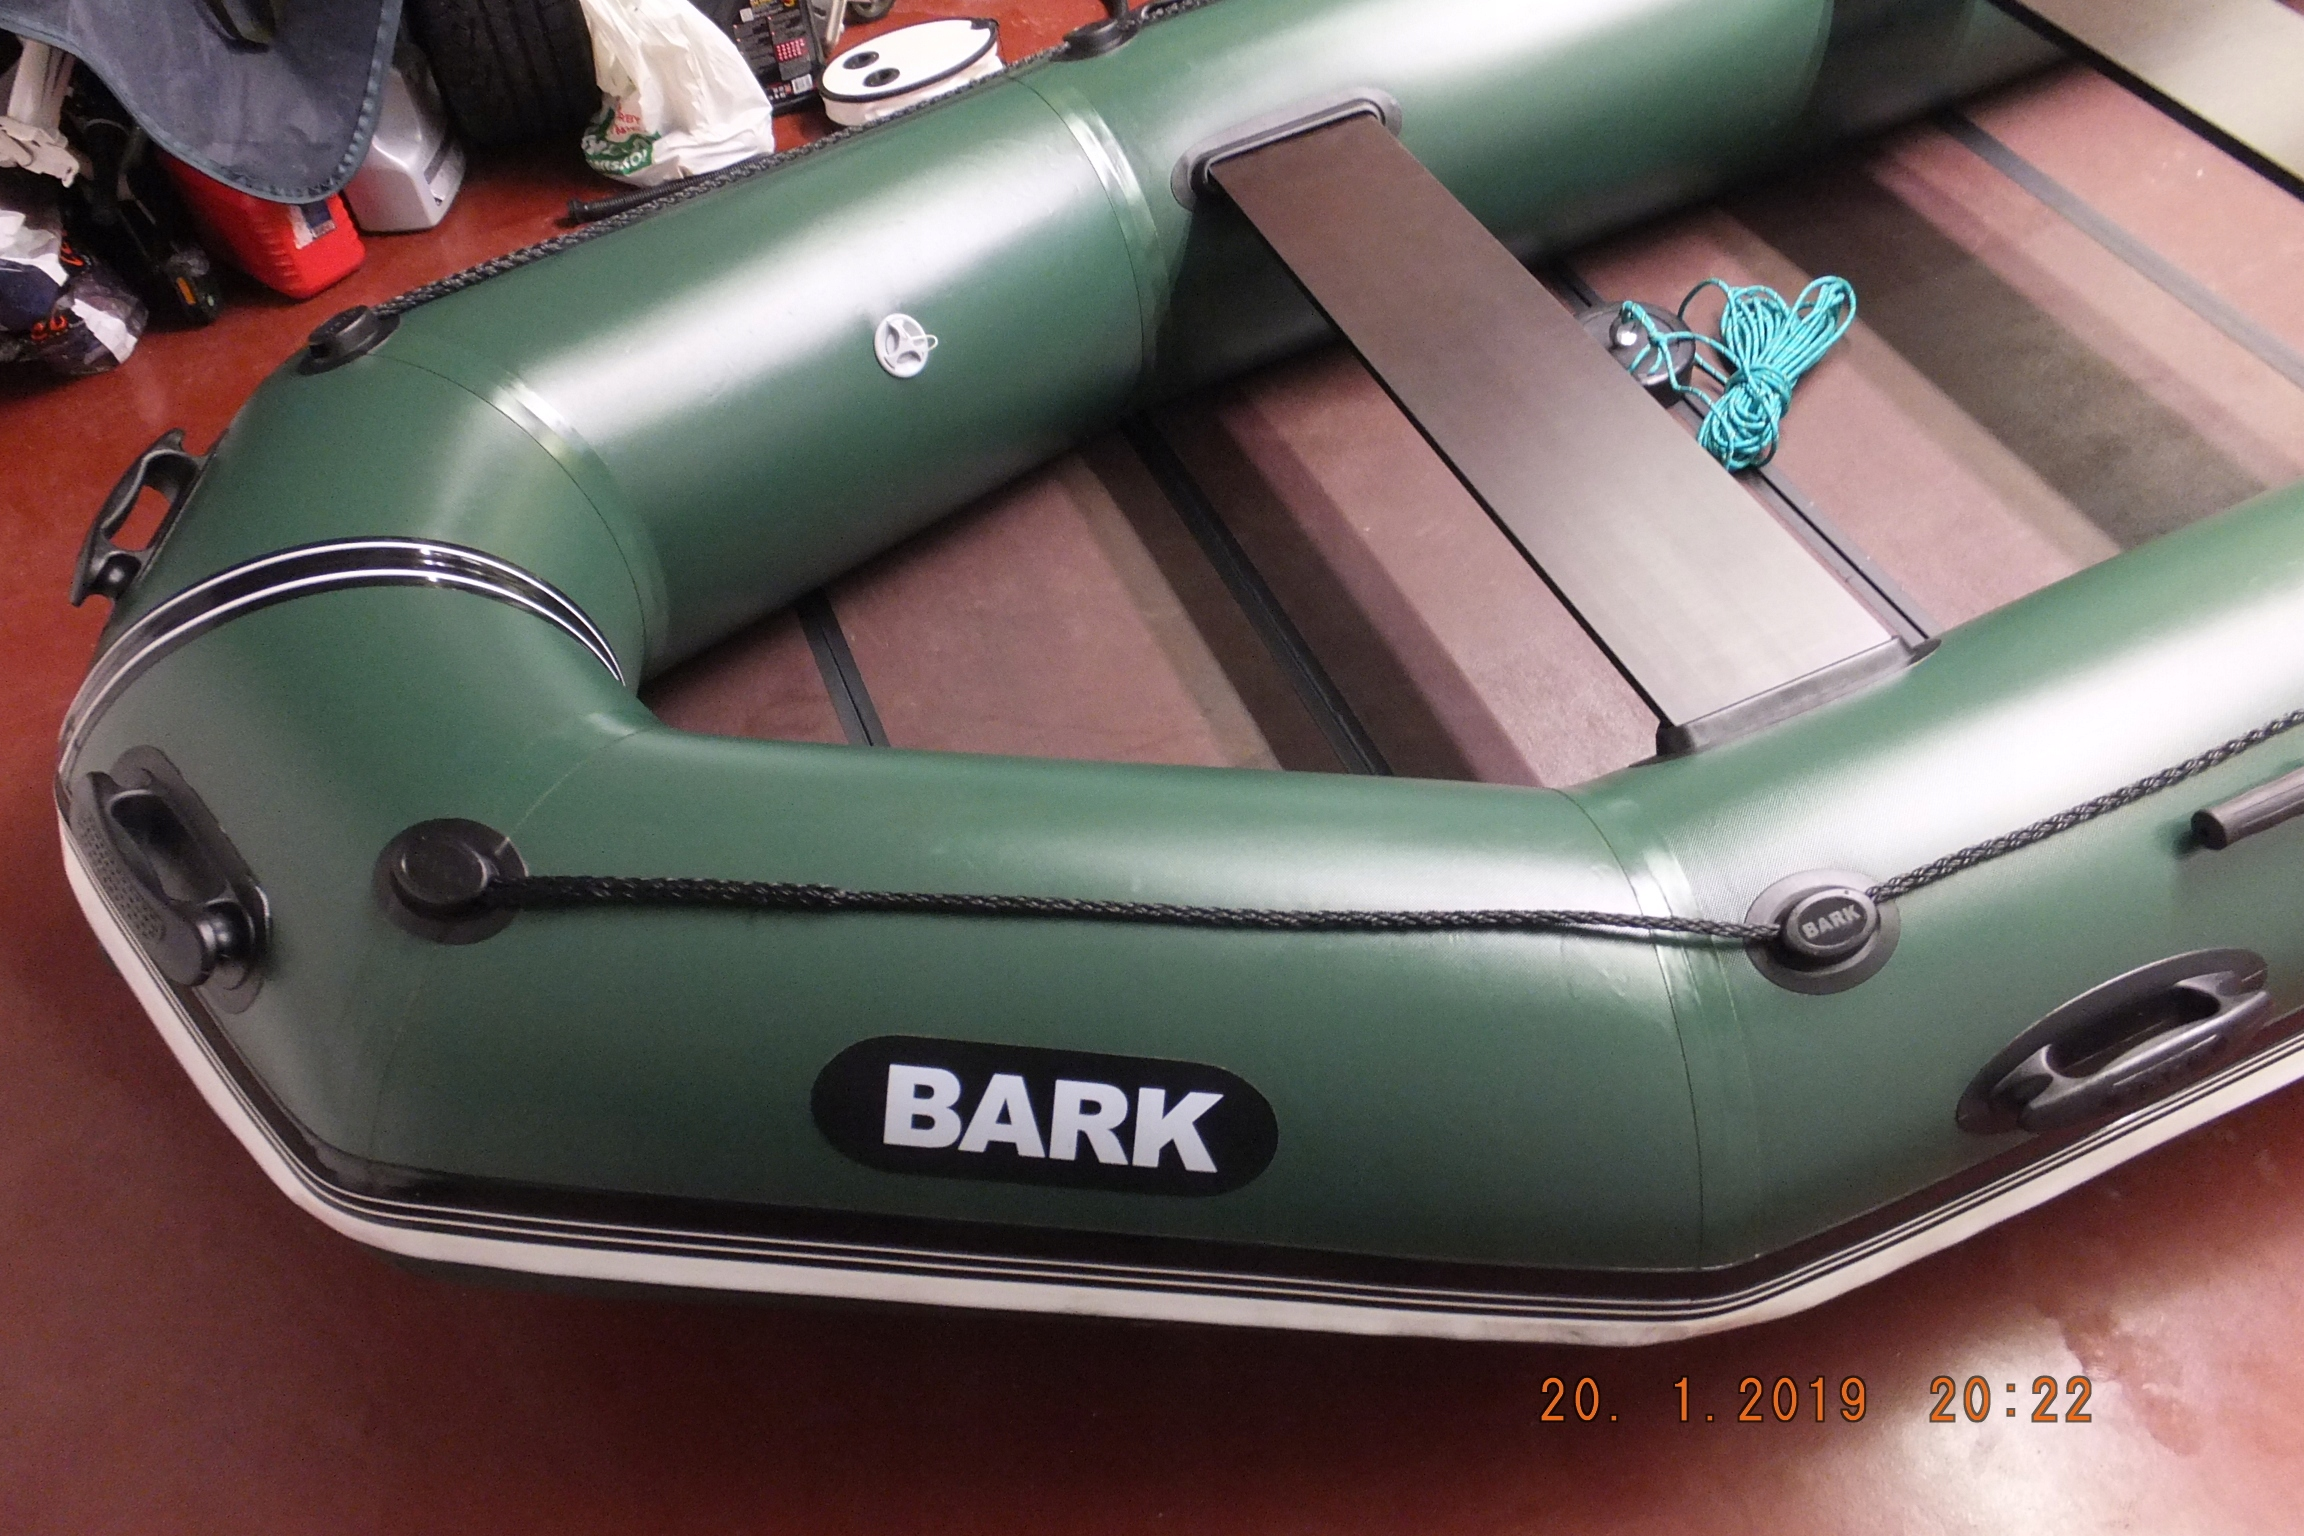 Ponton Bark BT-330K wędkarski podłoga książkowa